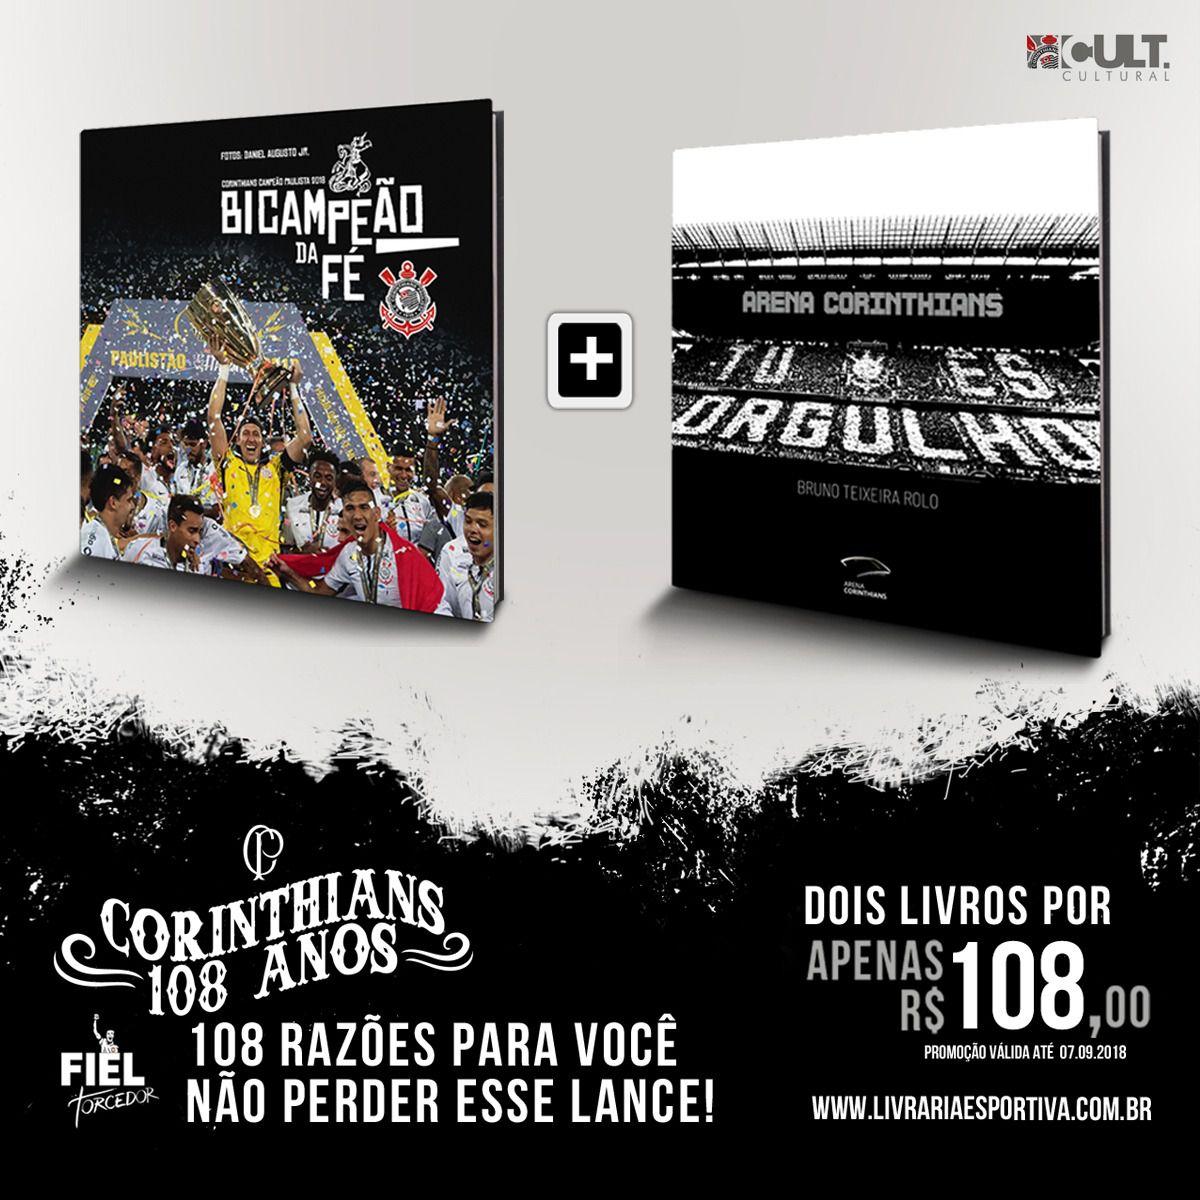 Combo Corinthians 108 Anos: CORINTHIANS, BICAMPEÃO DA FÉ + ARENA CORINTHIANS